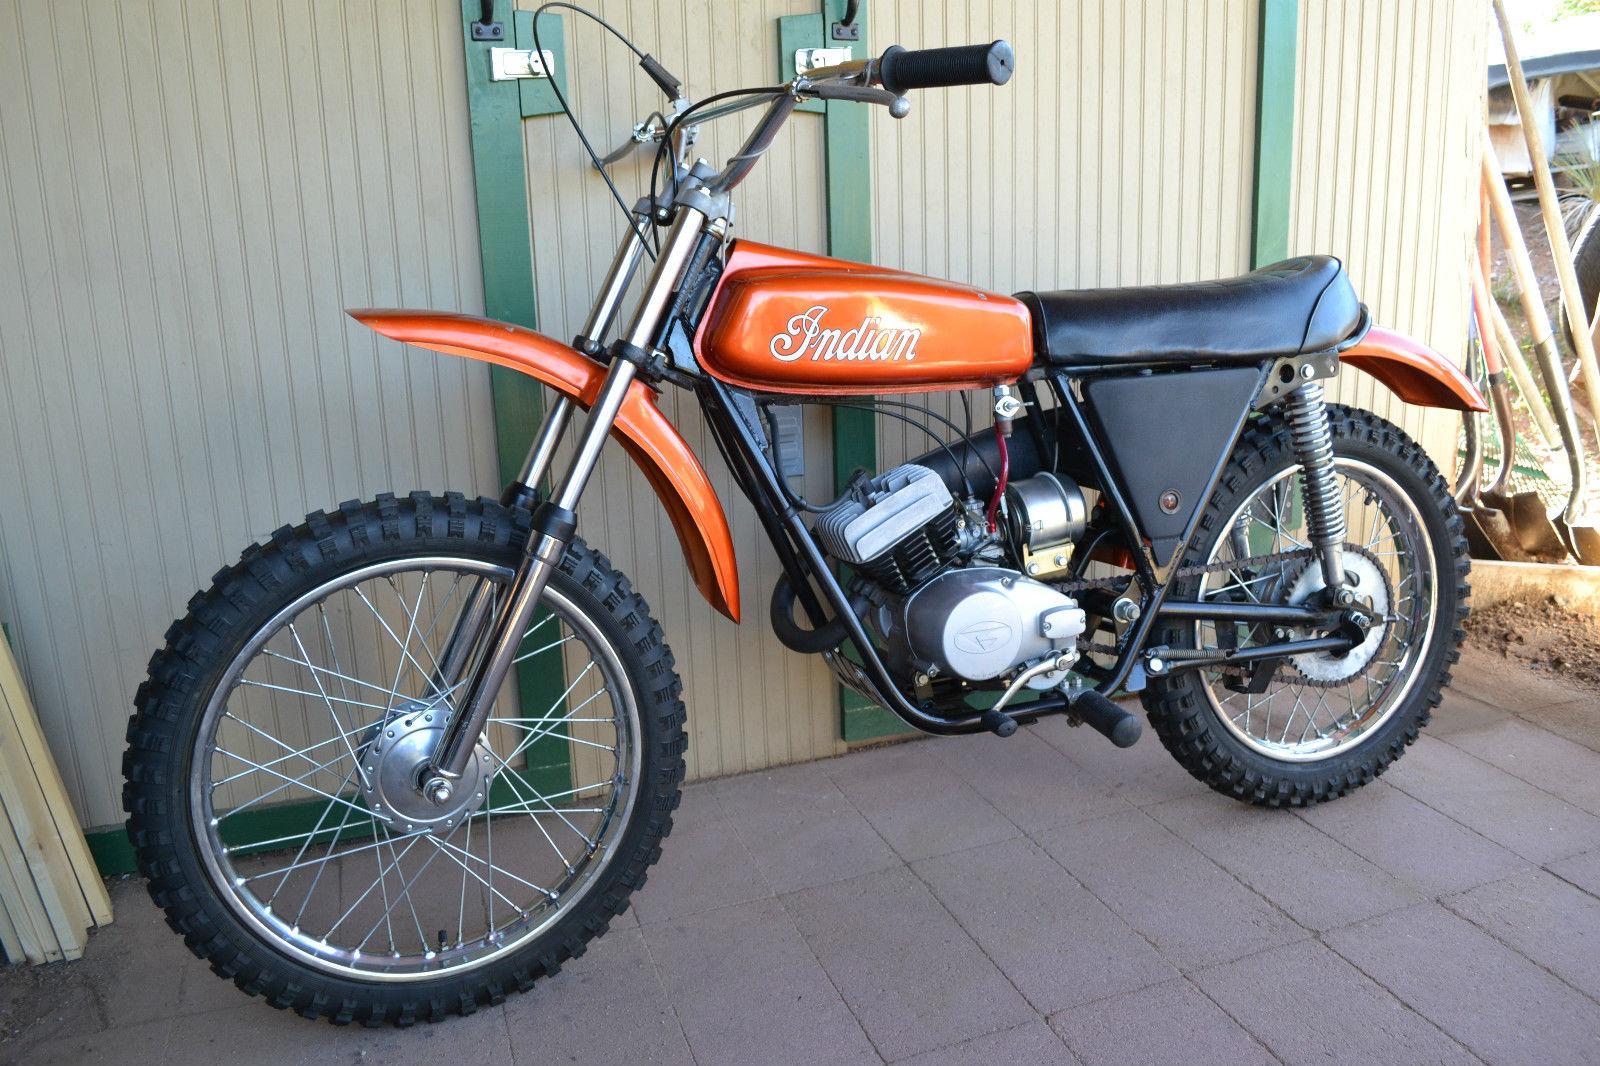 1974 indian mi 100 dirt bike indian 100cc mx. Black Bedroom Furniture Sets. Home Design Ideas